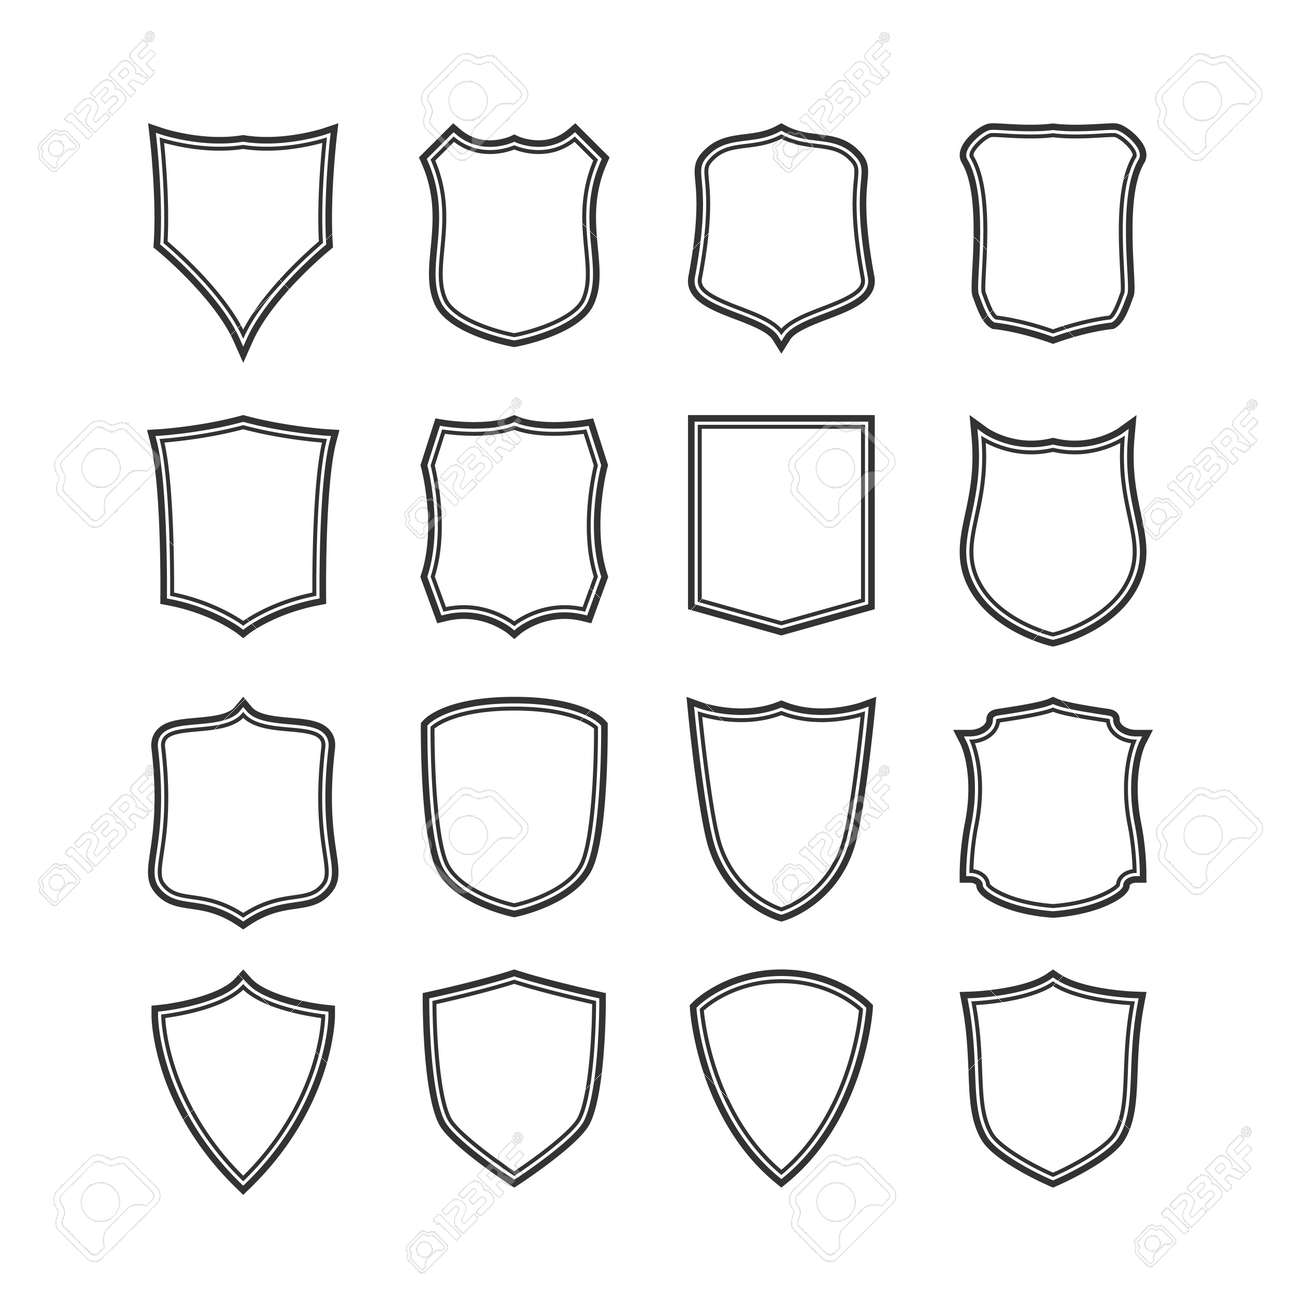 Big Set Of Blank, Classic Shields, Templates. Design Elements ...